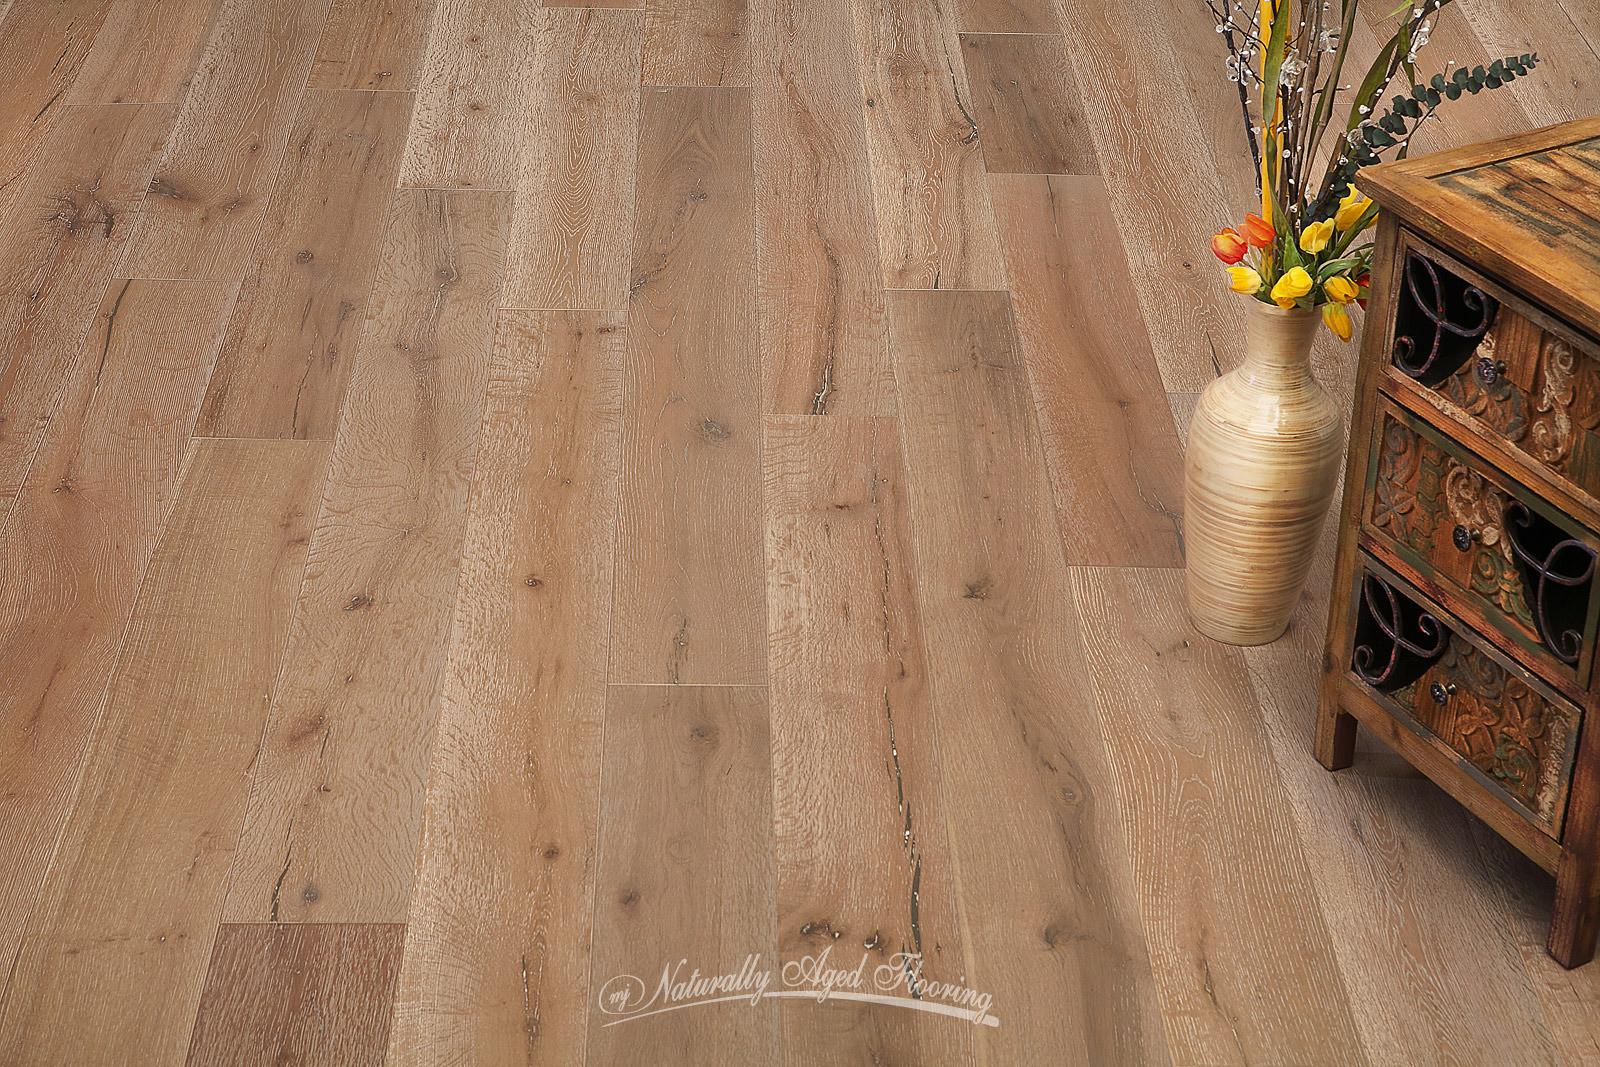 Hardwood Floor Stair Nose Of Notting Hill Naturally Aged Flooring Regarding Gallery